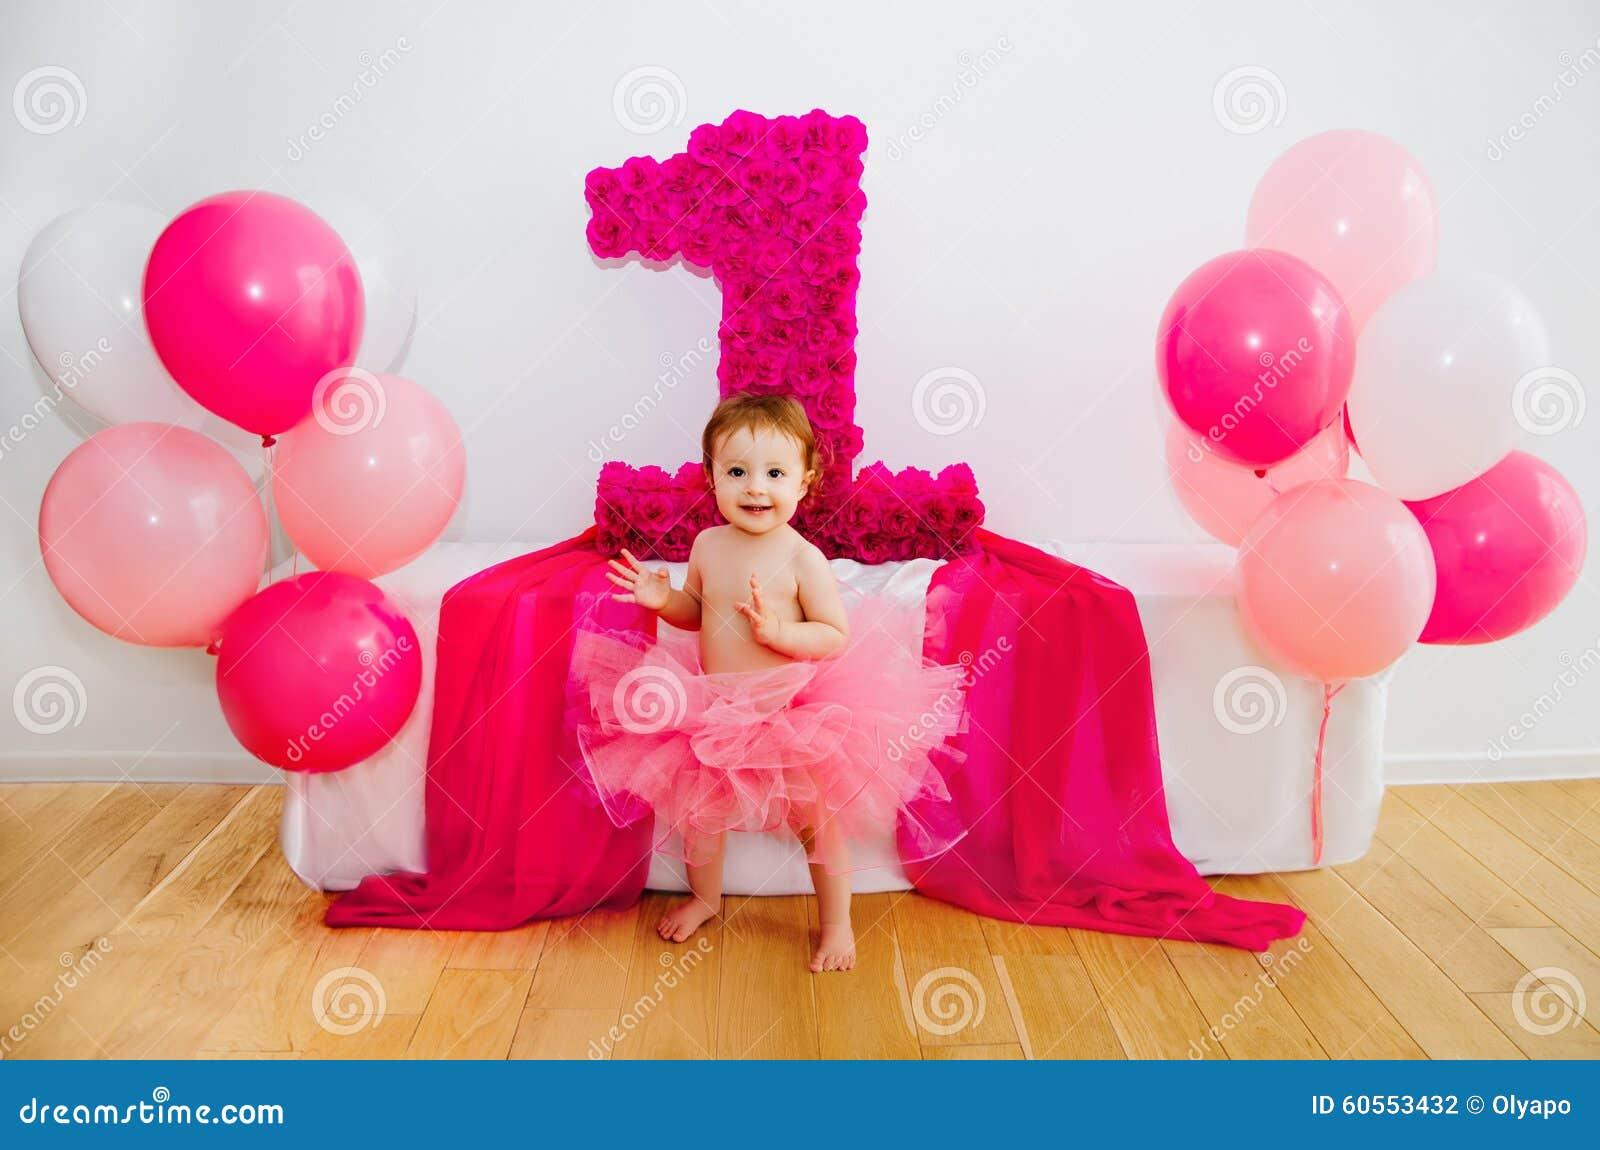 premier anniversaire b b dans la jupe rose pelucheuse. Black Bedroom Furniture Sets. Home Design Ideas